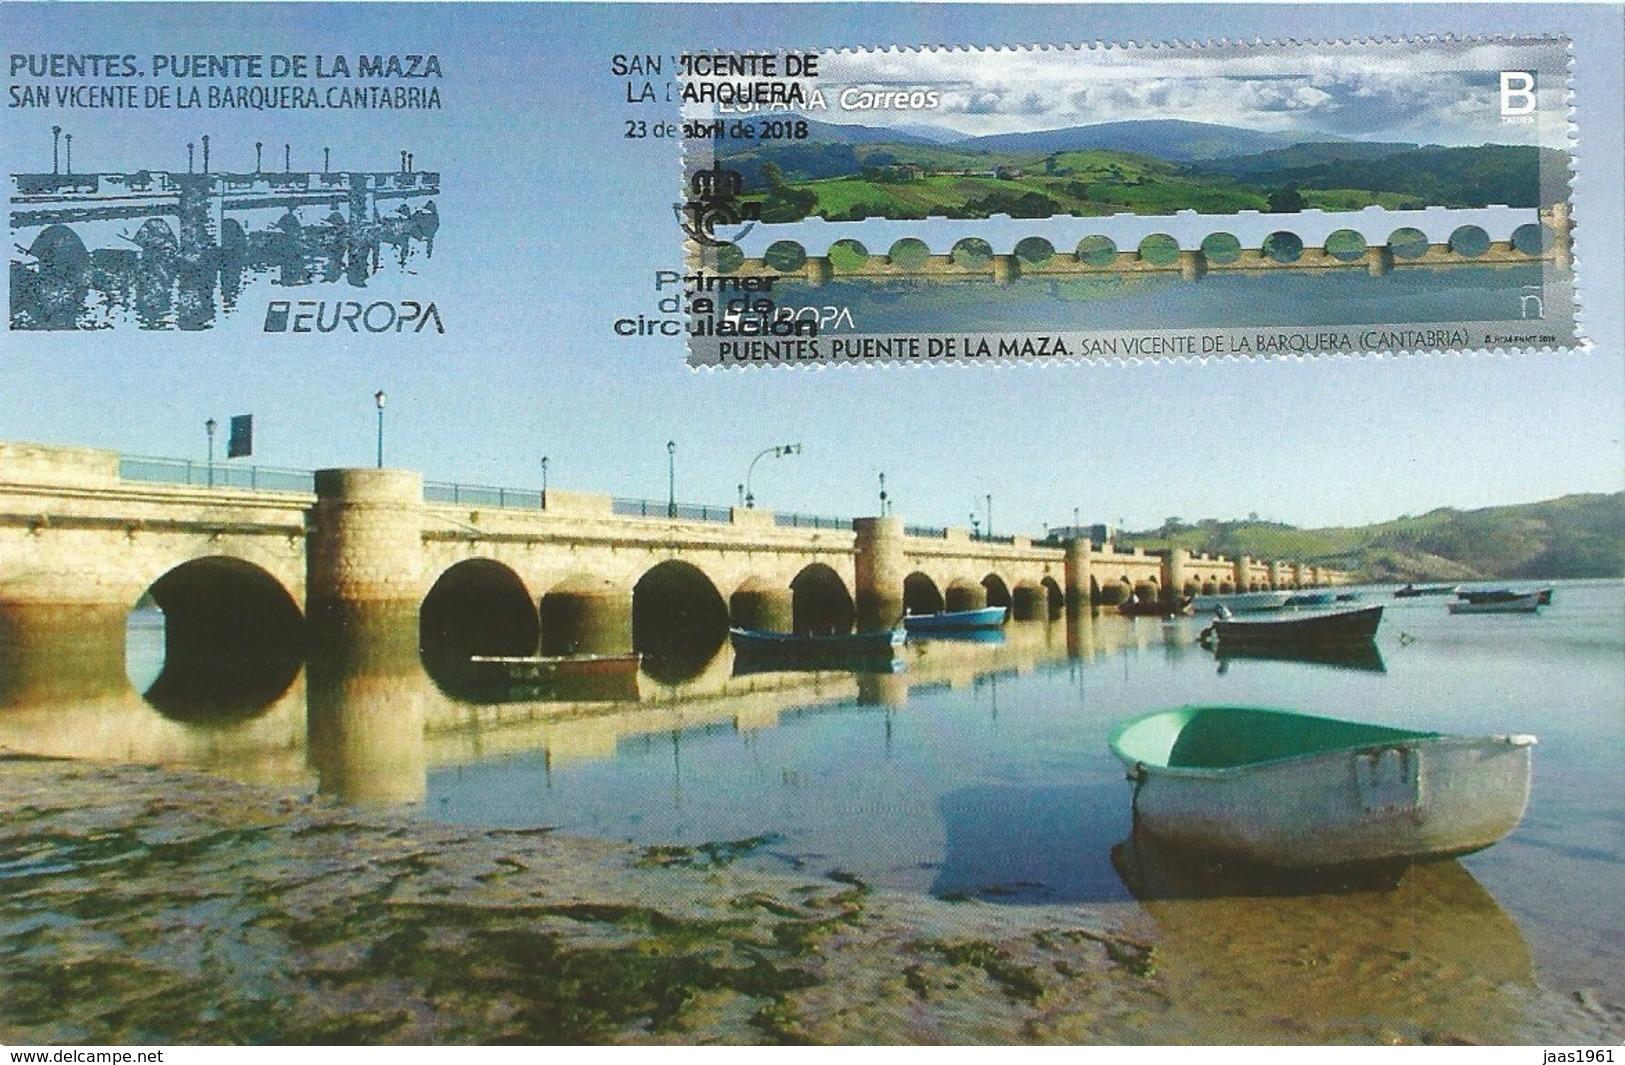 SPAIN. MAXICARD FIRST DAY. MAZA BRIDGE. SAN VICENTE DE LA BARQUERA. 2018 - Tarjetas Máxima